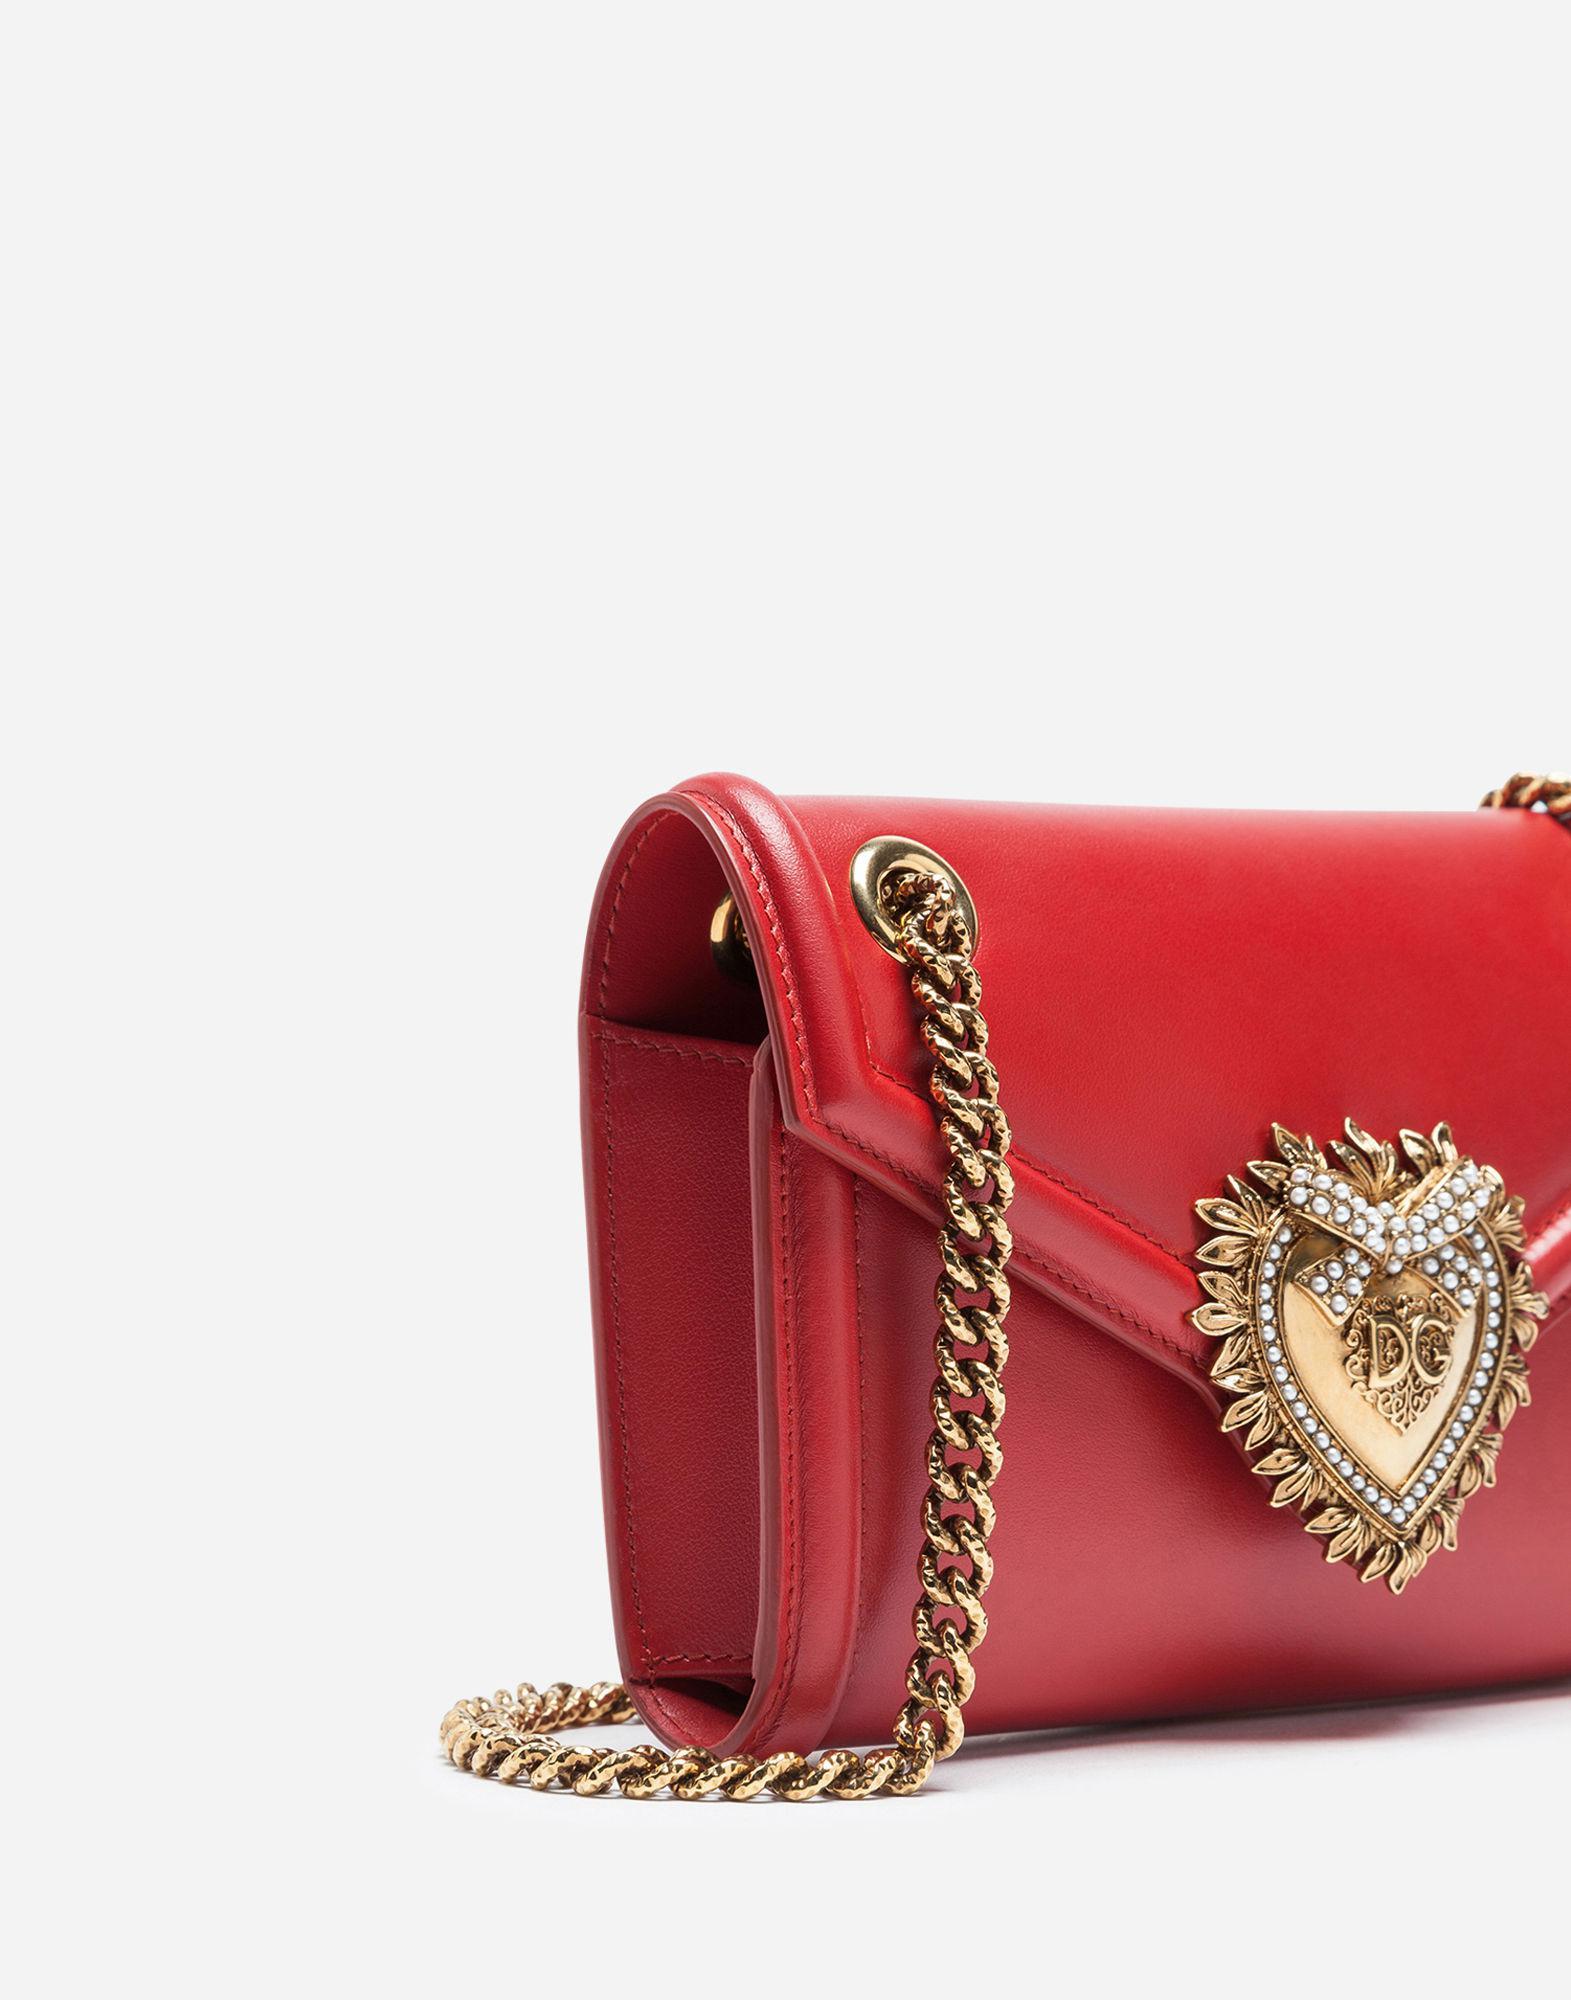 Lyst - Dolce   Gabbana Mini Devotion Bag In Smooth Calfskin in Red de55e0ba13aba